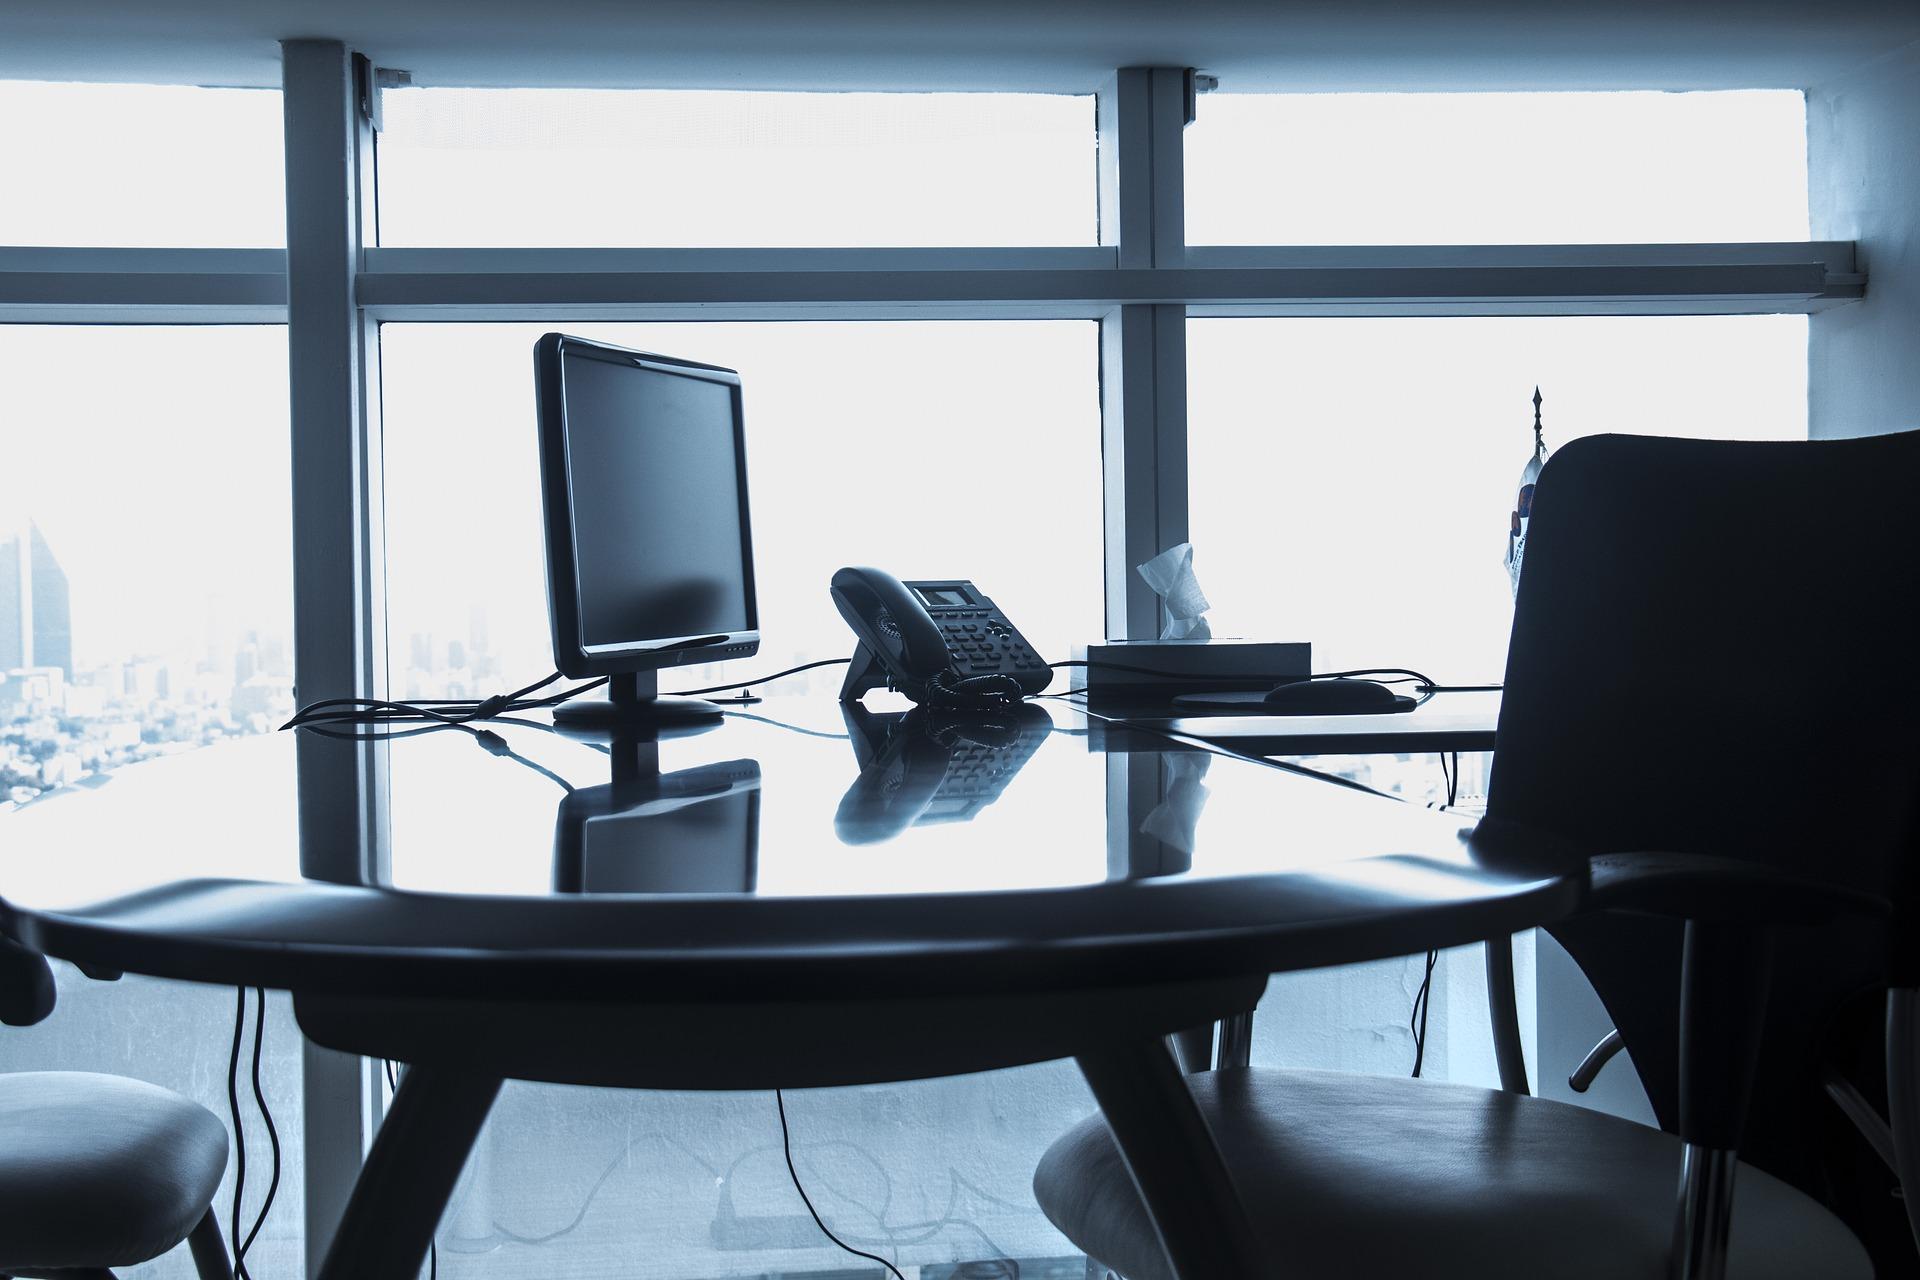 Telecoms Office desk phone